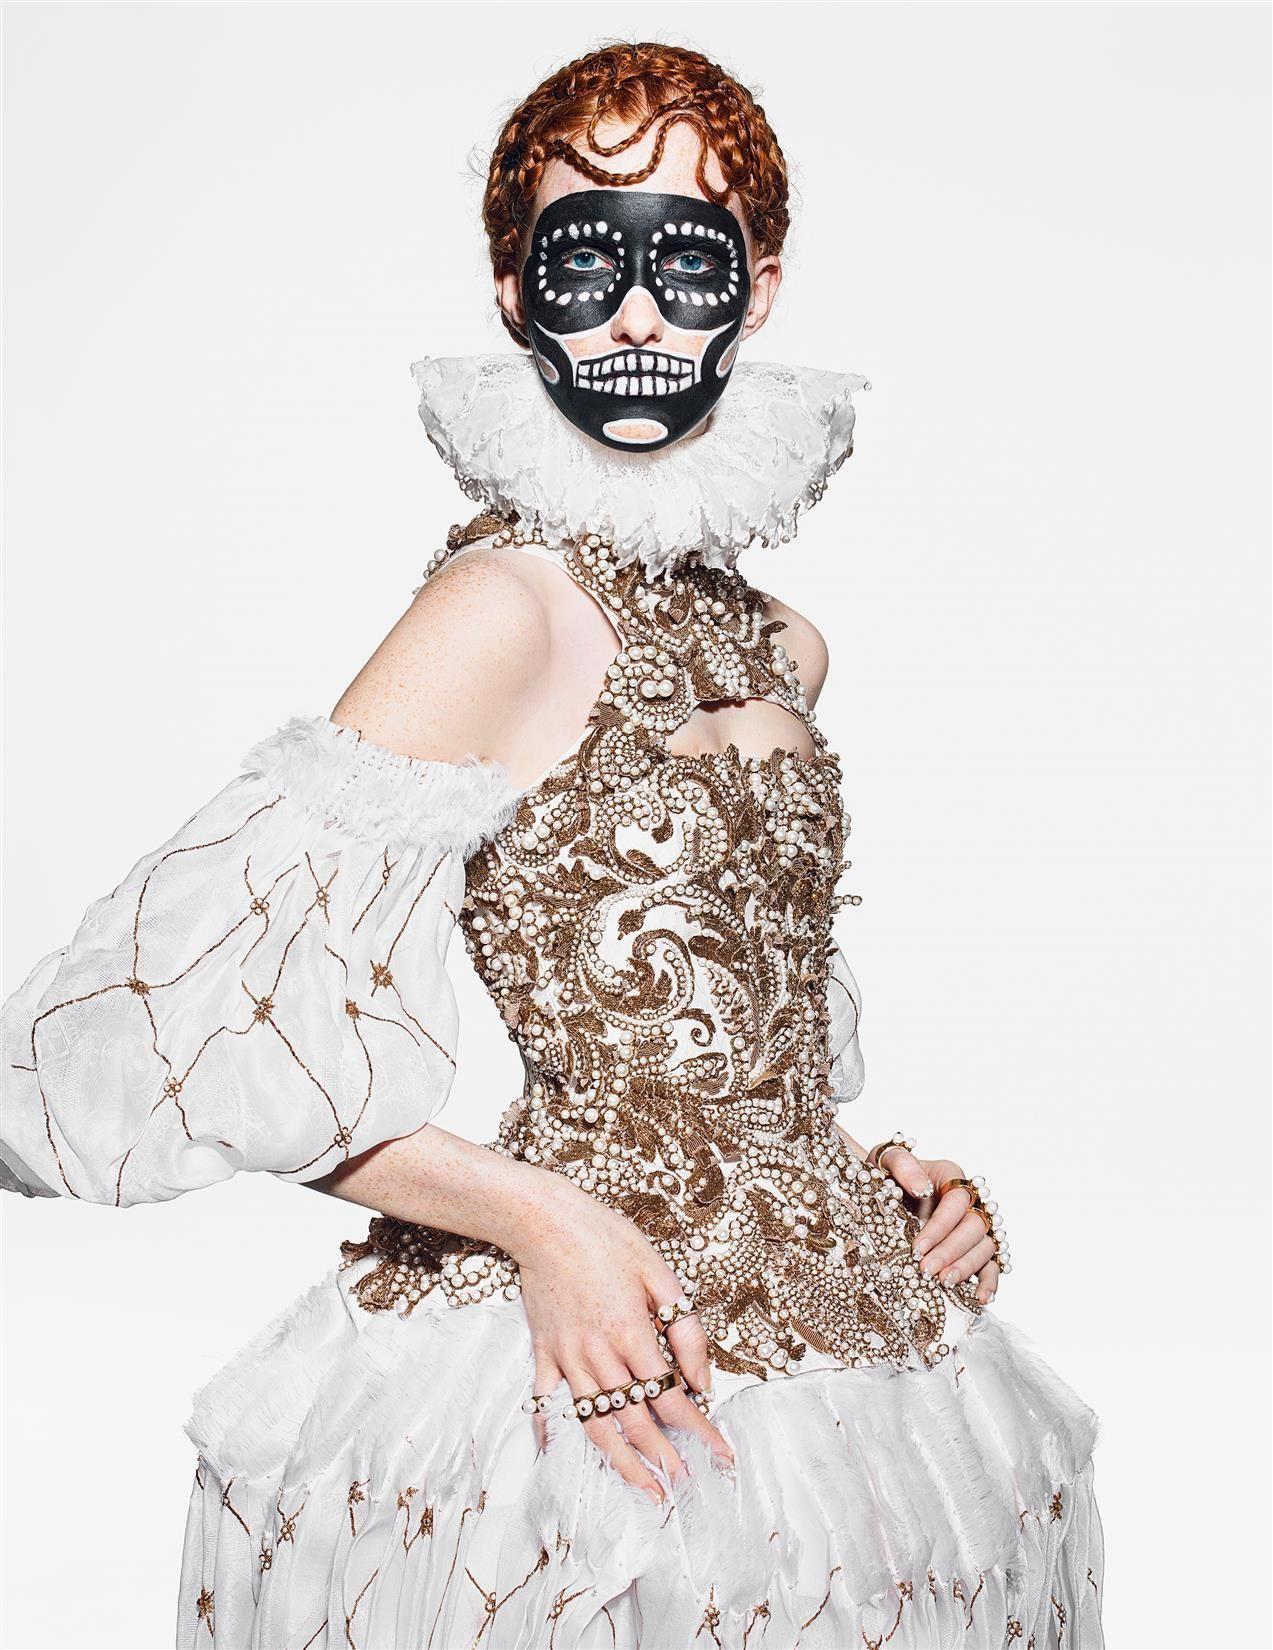 Art + Commerce - Artists - Photographers - Richard Burbridge - Dazed & Confused McQueen